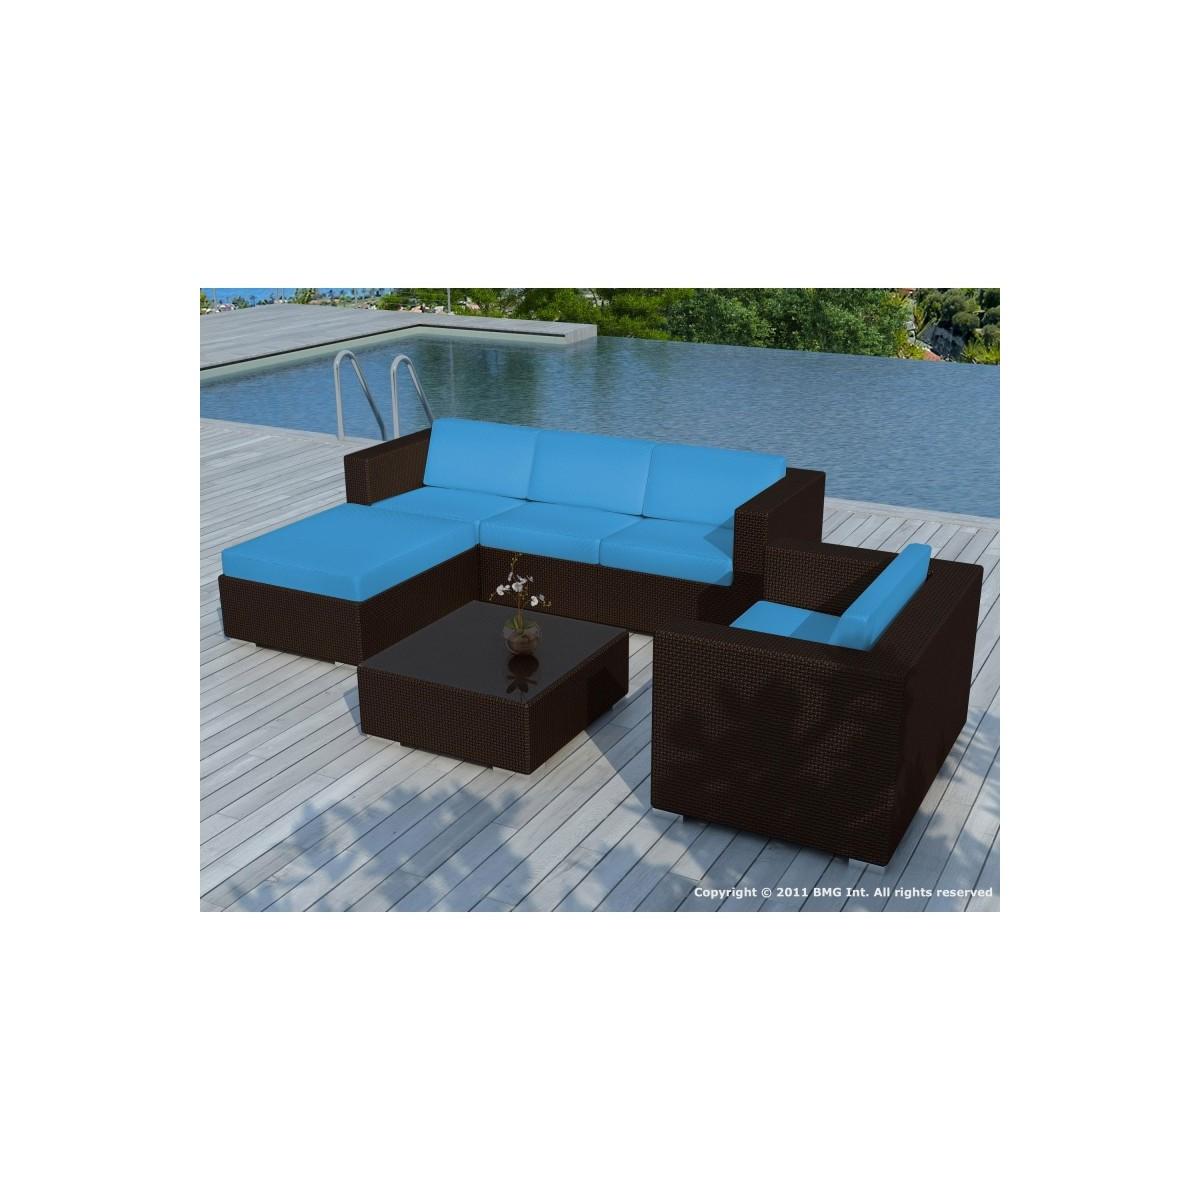 gartenmobel 5 quadrate sevilla harz geflochten braun blau kissen amp story 4116